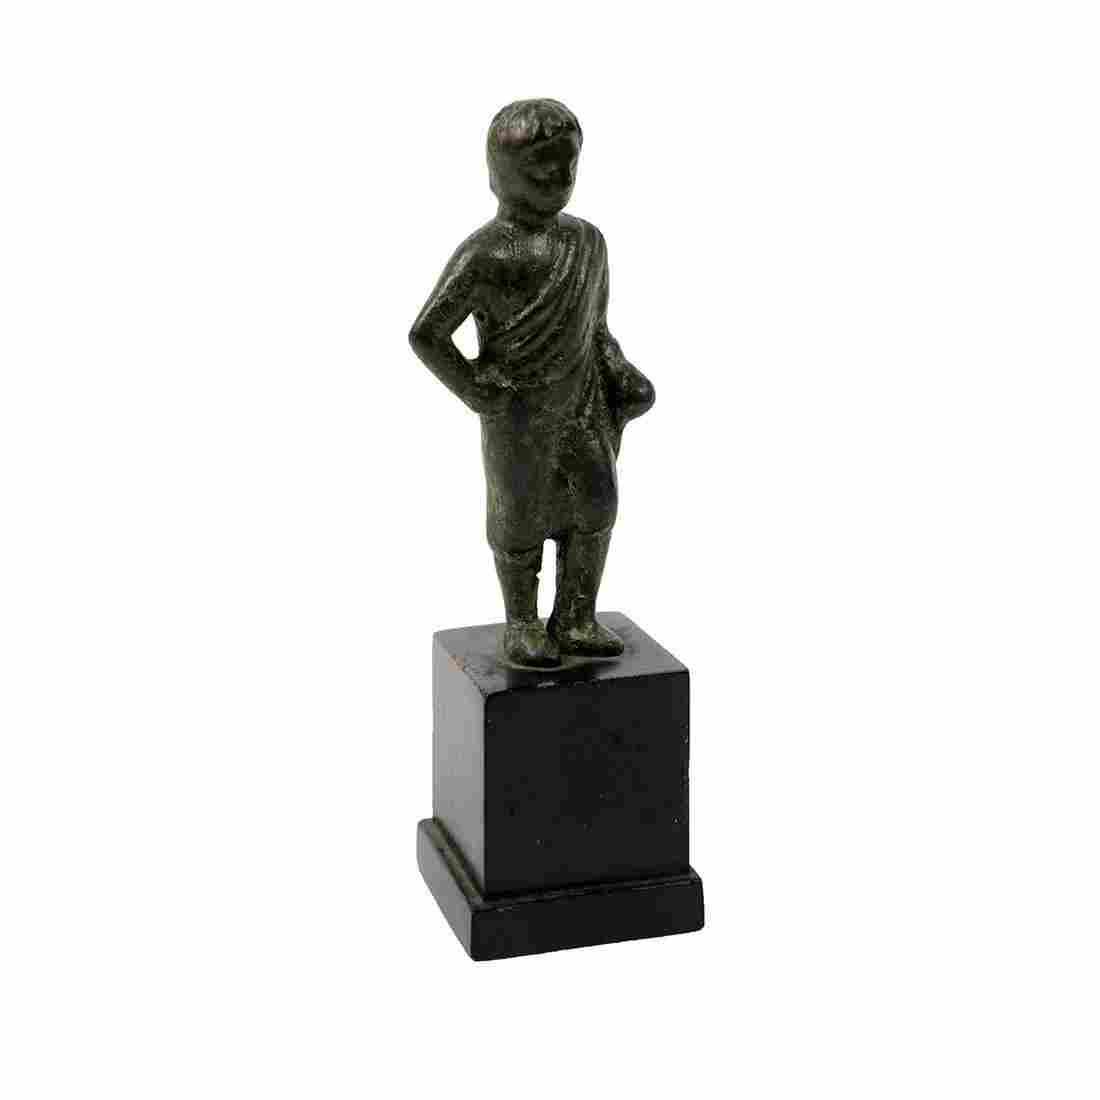 Ancient Roman Bronze figure of man c.1st-2nd century